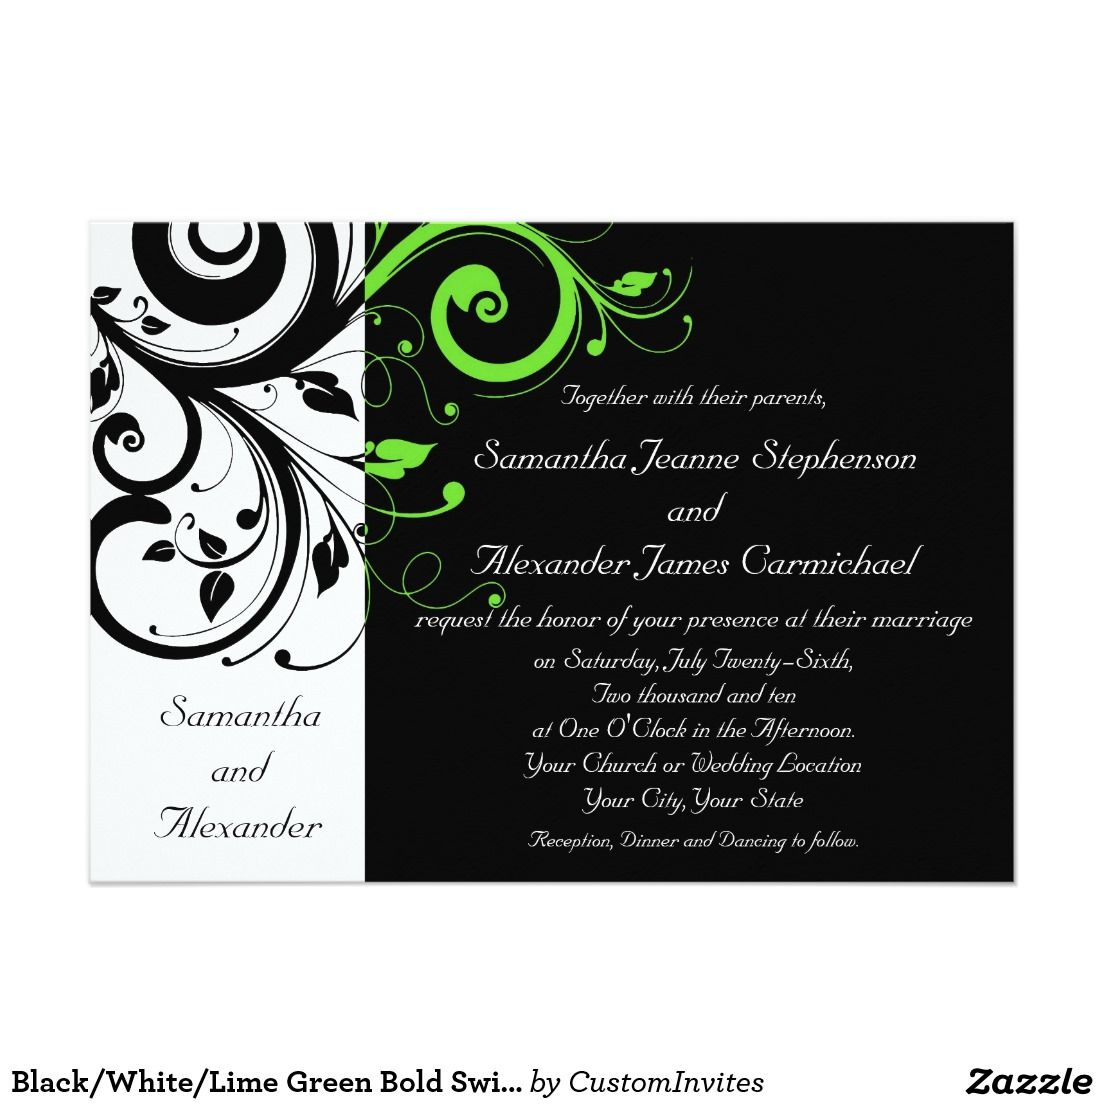 Black/White/Lime Green Bold Swirl Wedding Card | Wedding, Weddings ...